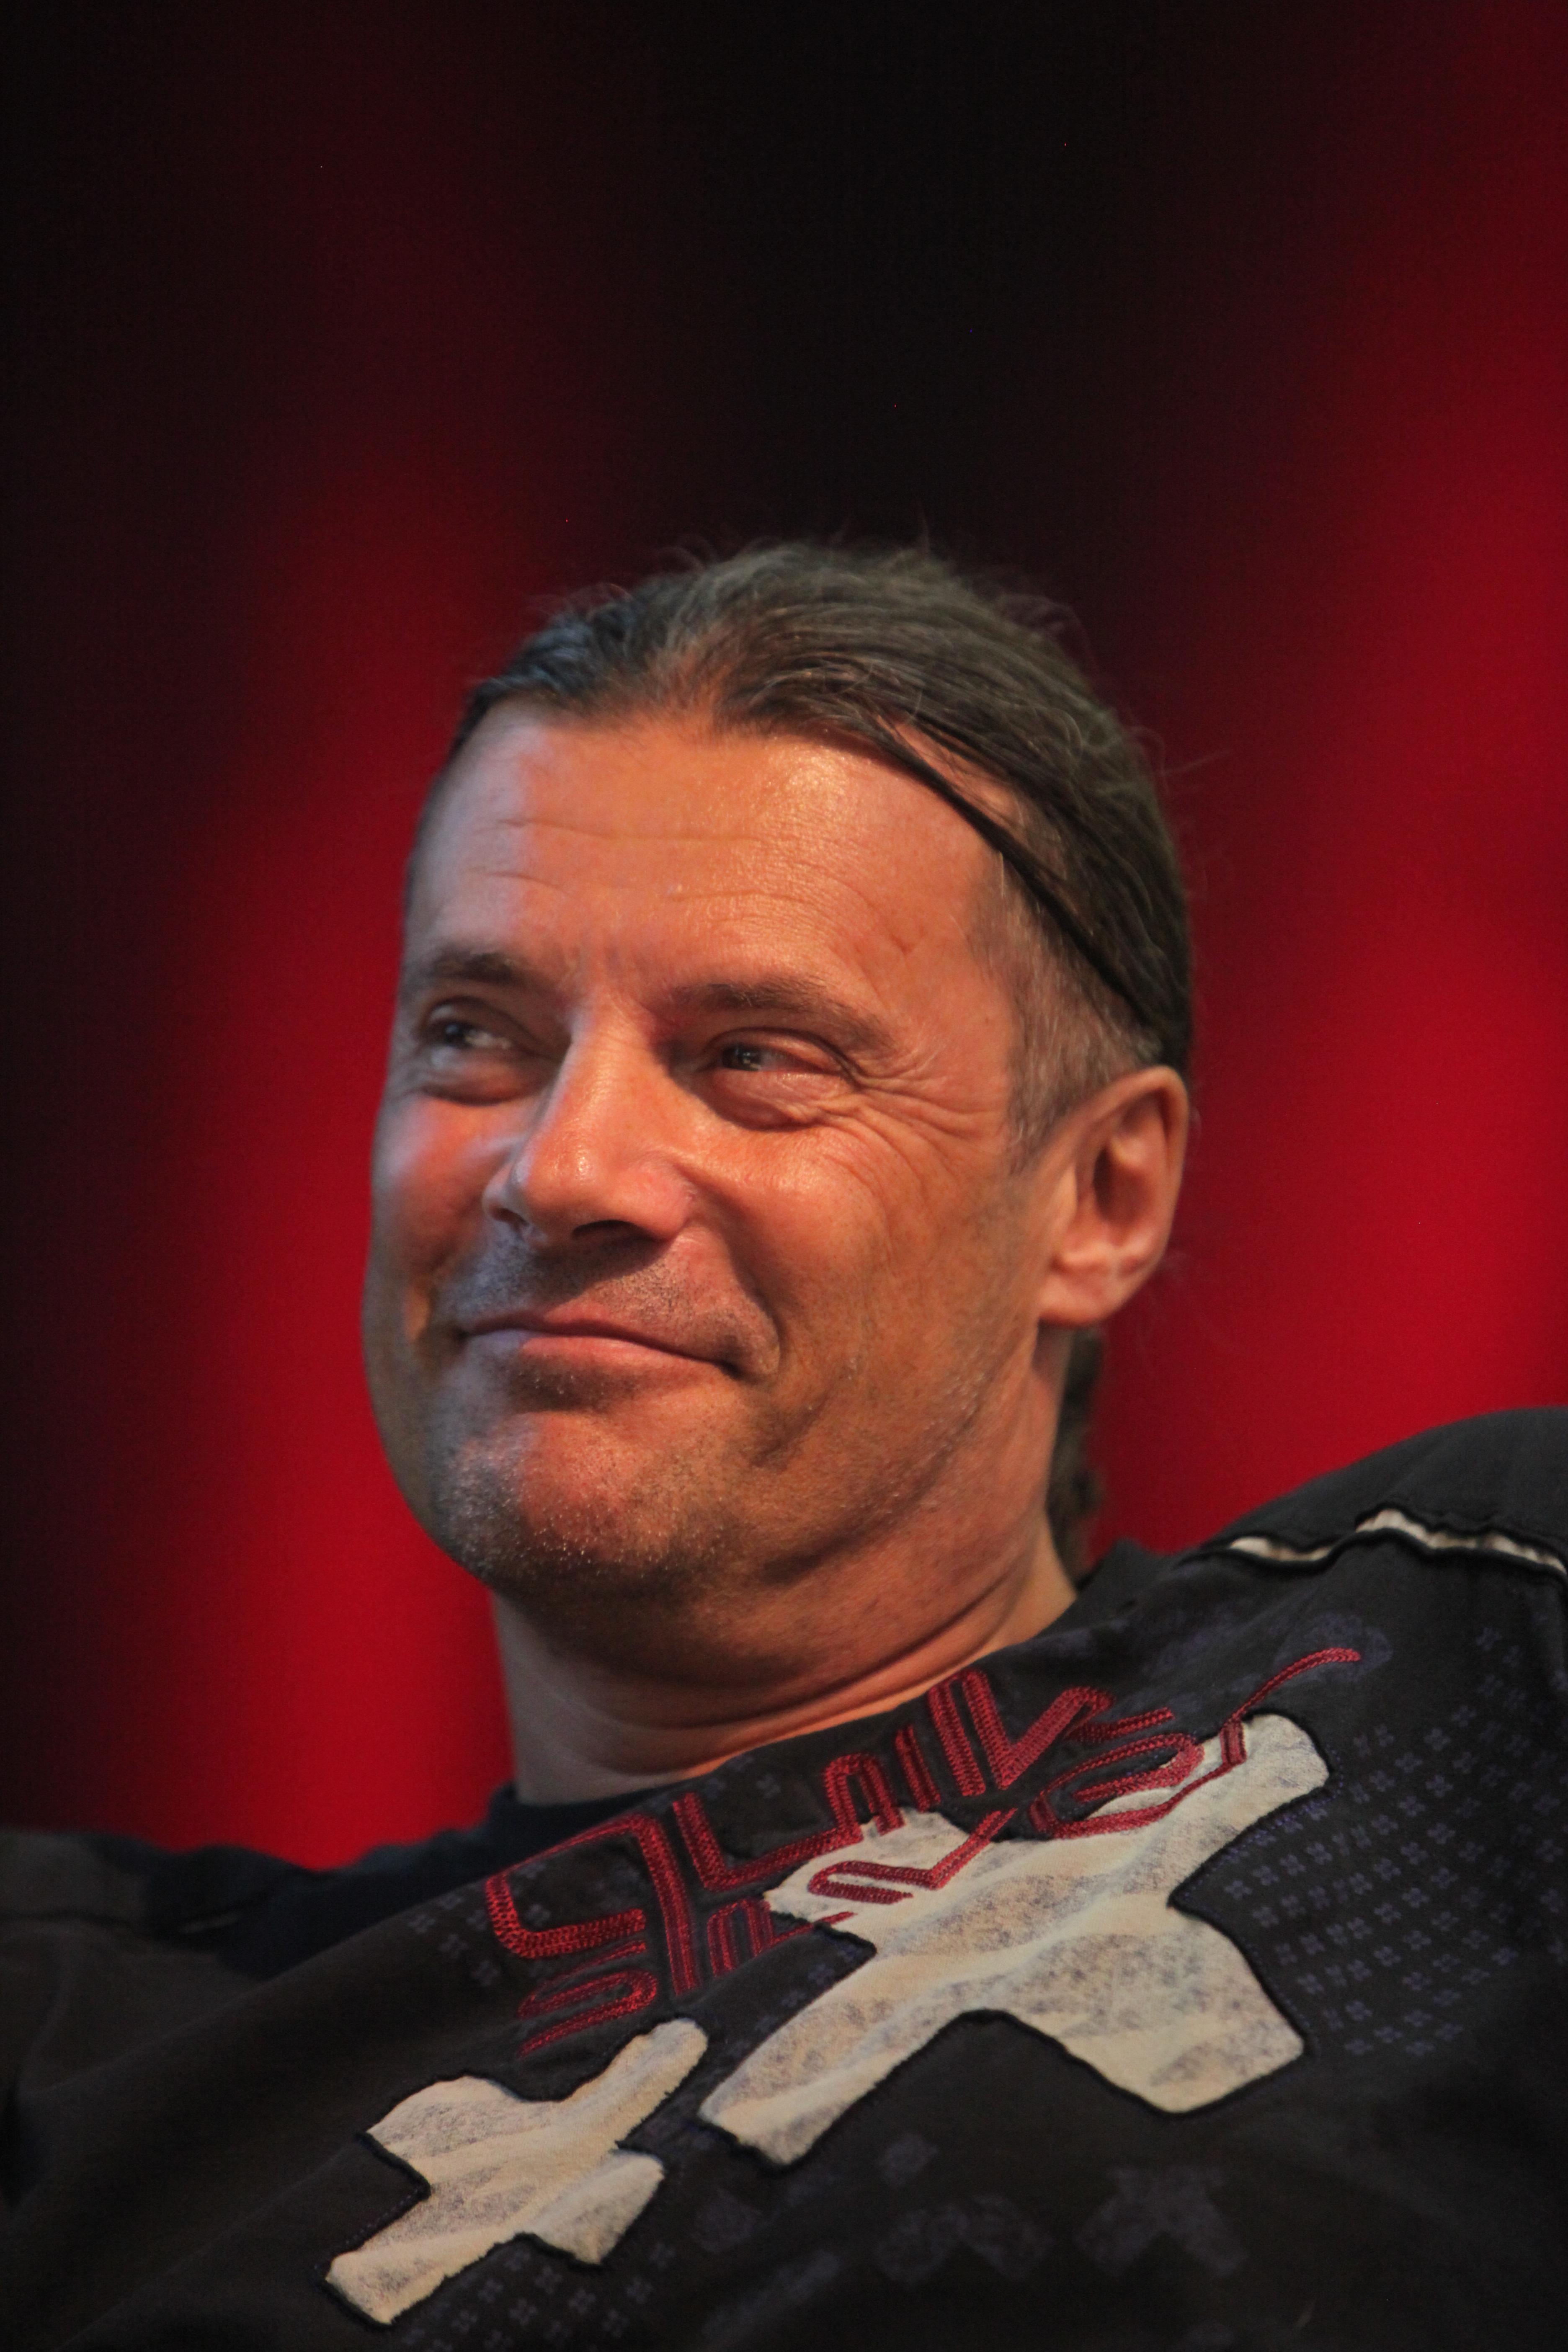 http://upload.wikimedia.org/wikipedia/commons/a/a6/Oskar_Freysinger_IMG_2614.JPG